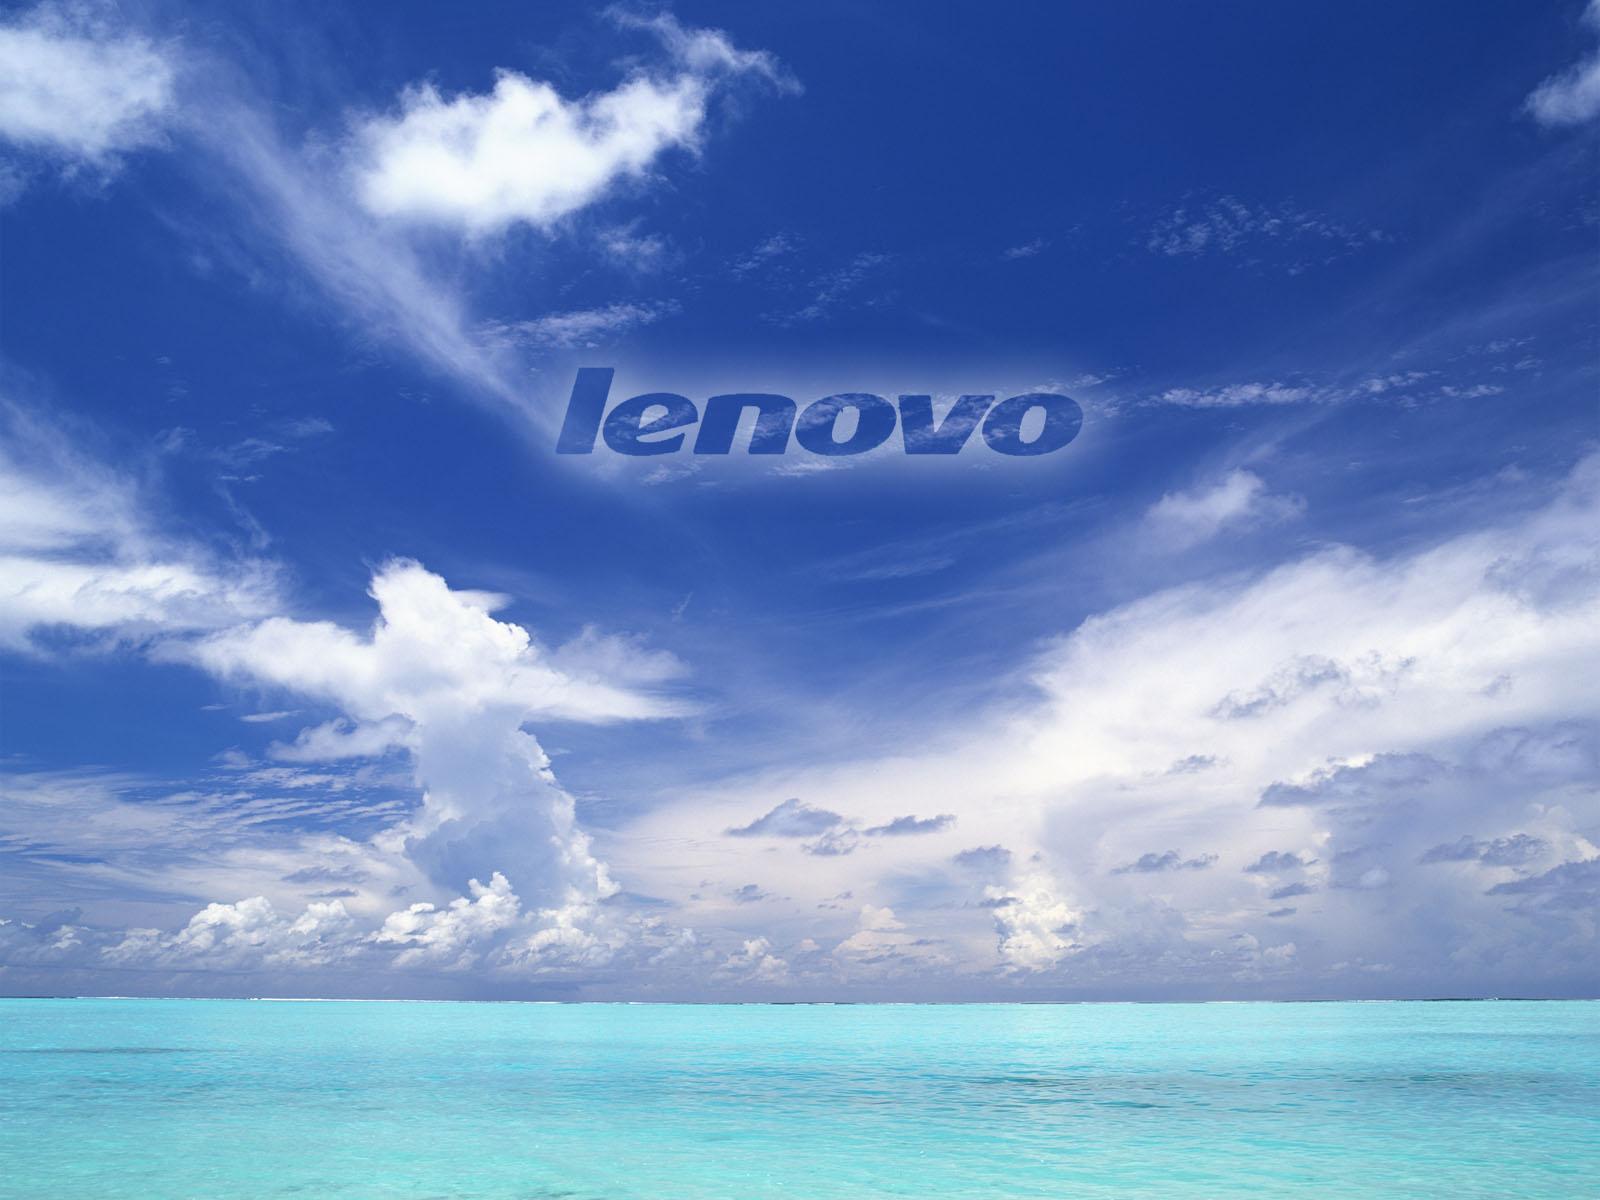 lenovo wallpaper themes,sky,cloud,blue,daytime,sea